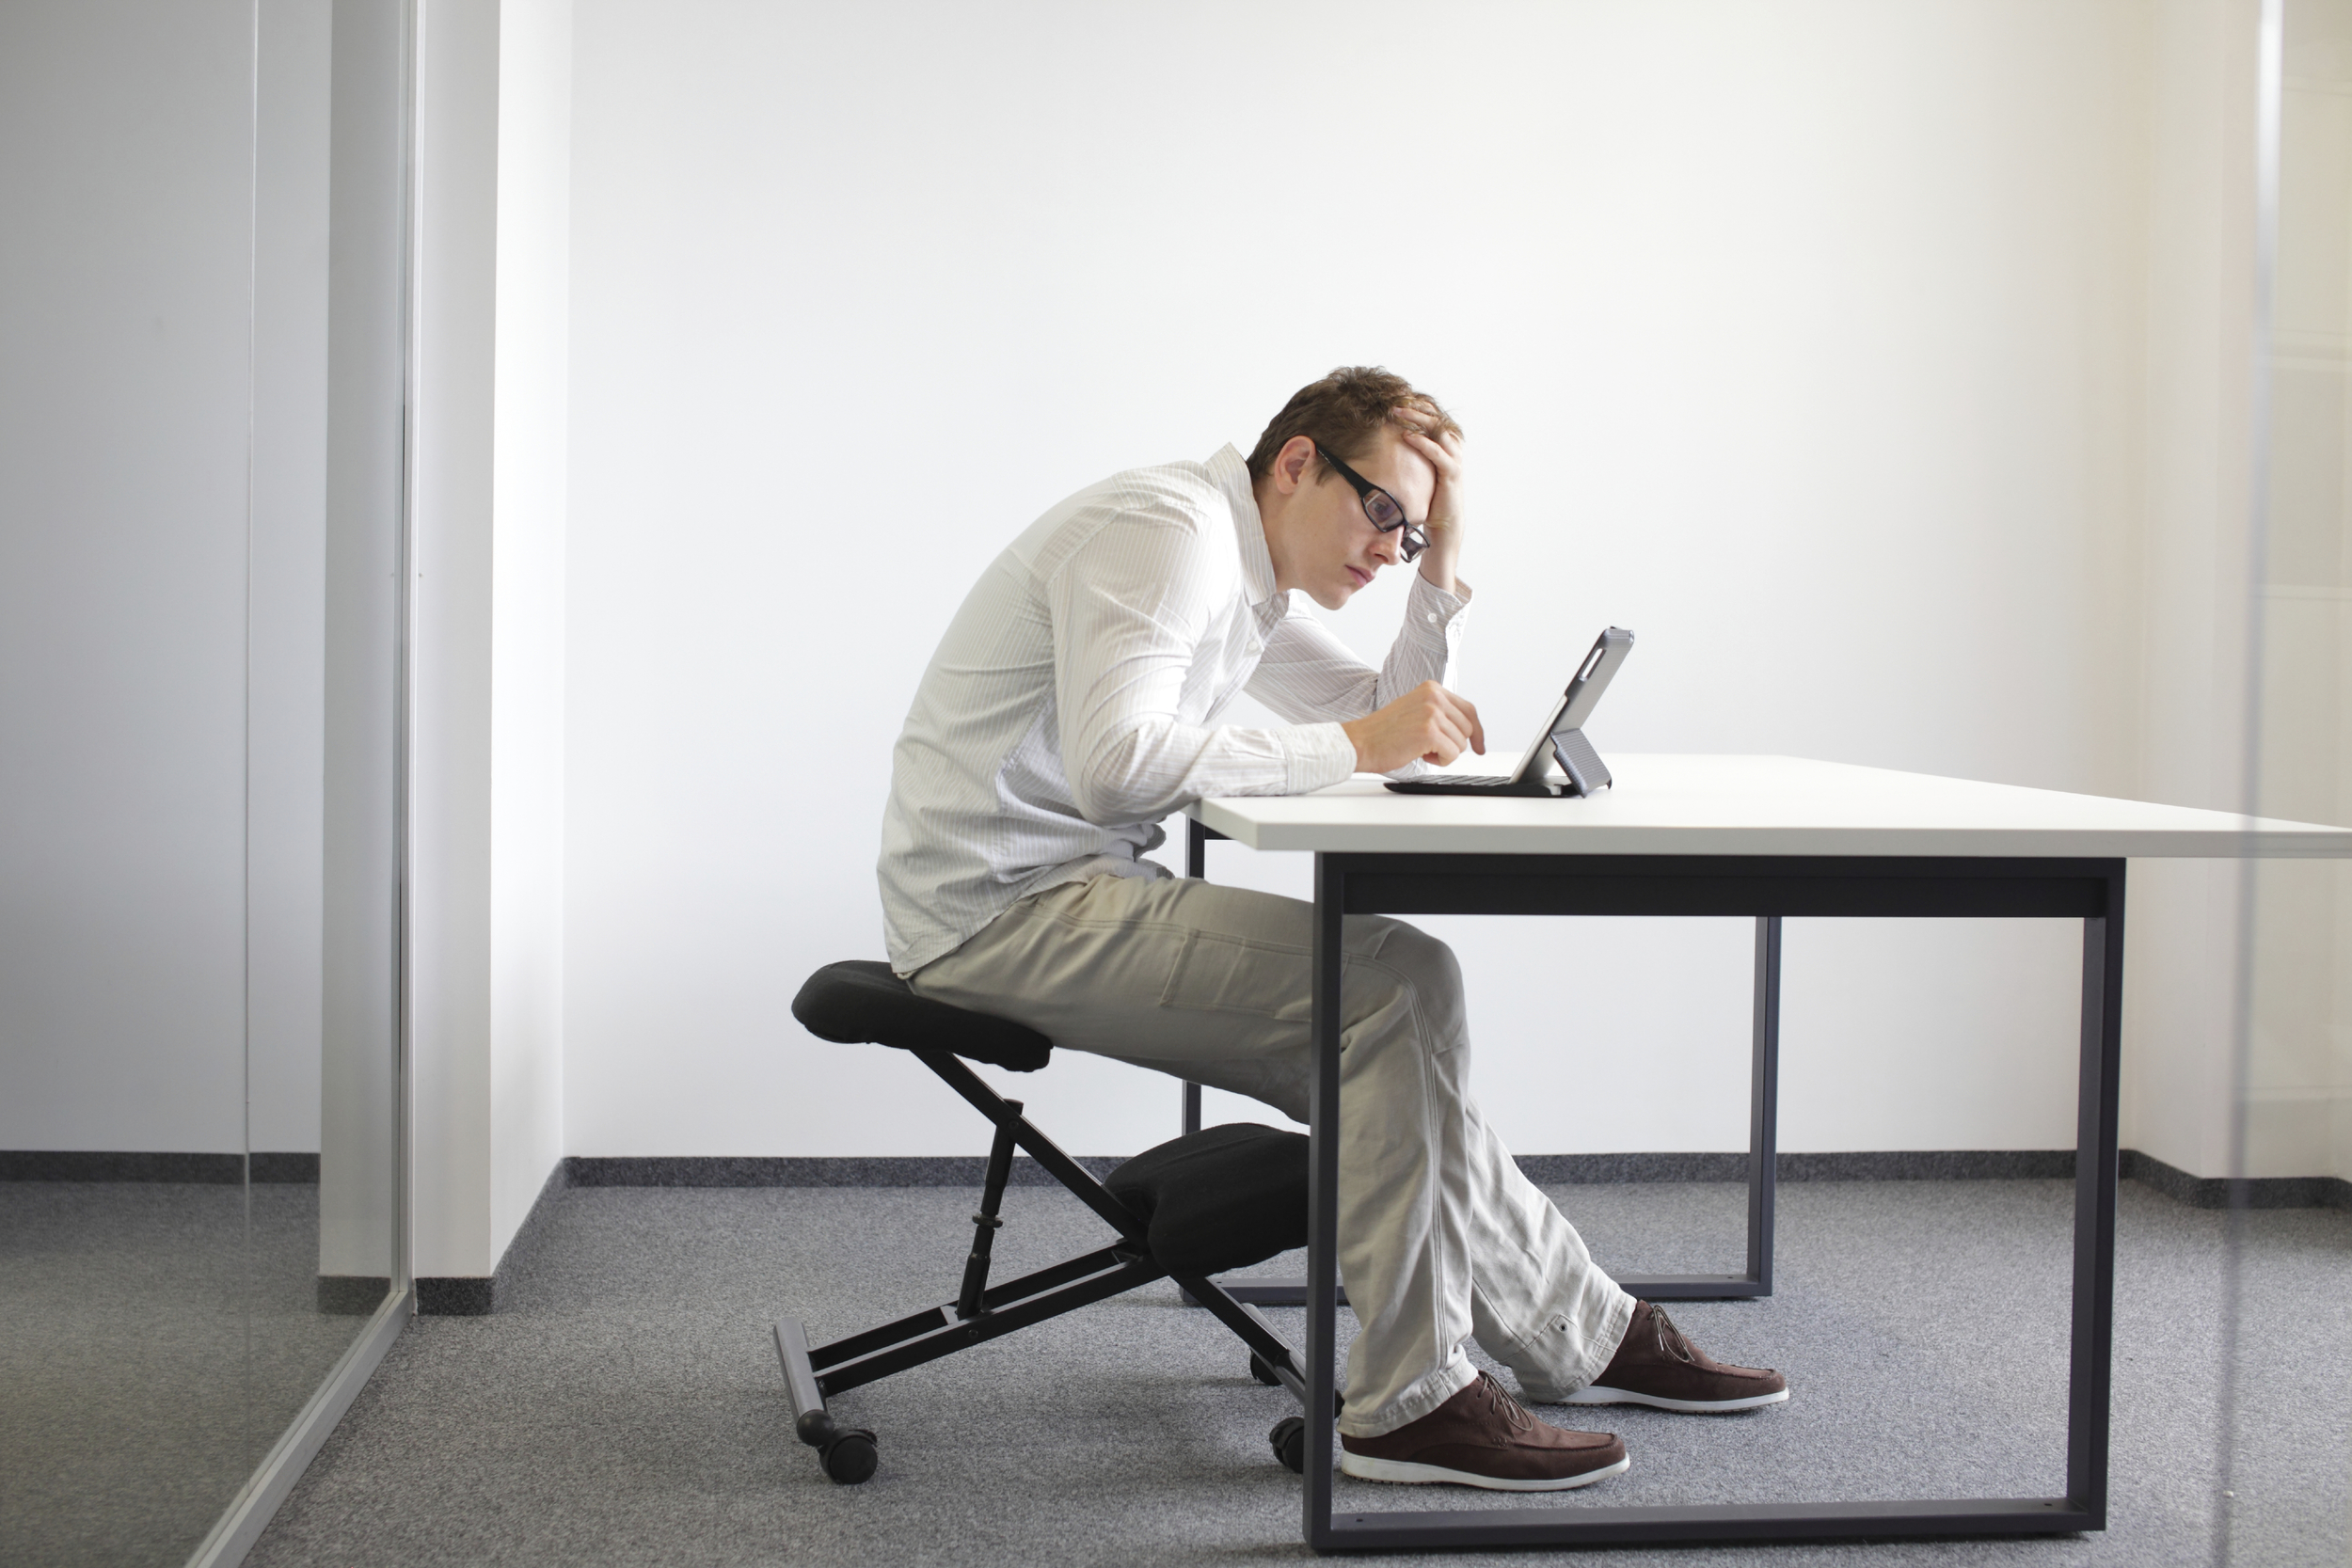 bad-posture-overall-health